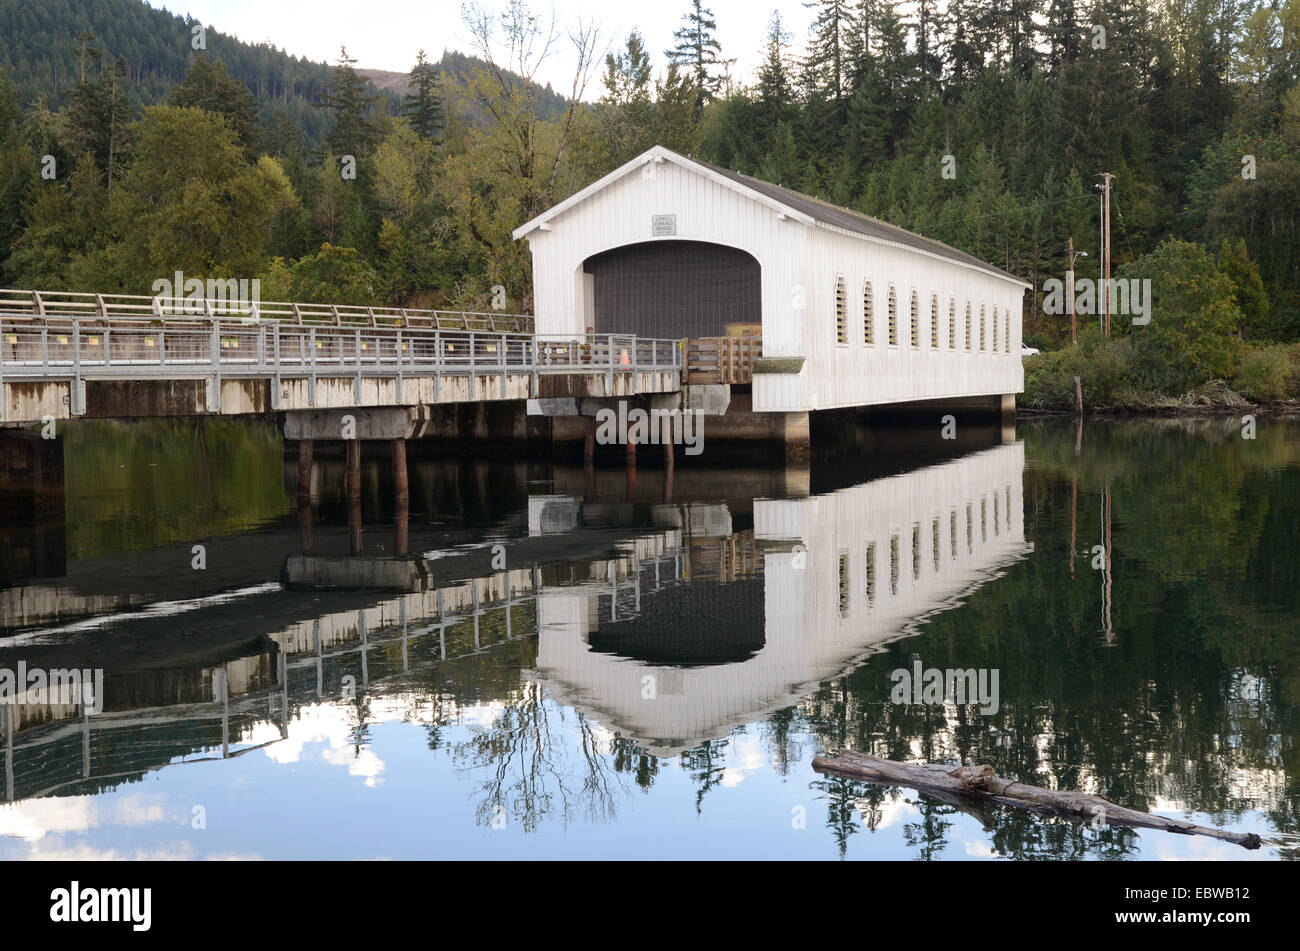 Lowell Covered Bridge, Oregon, USA - Stock Image